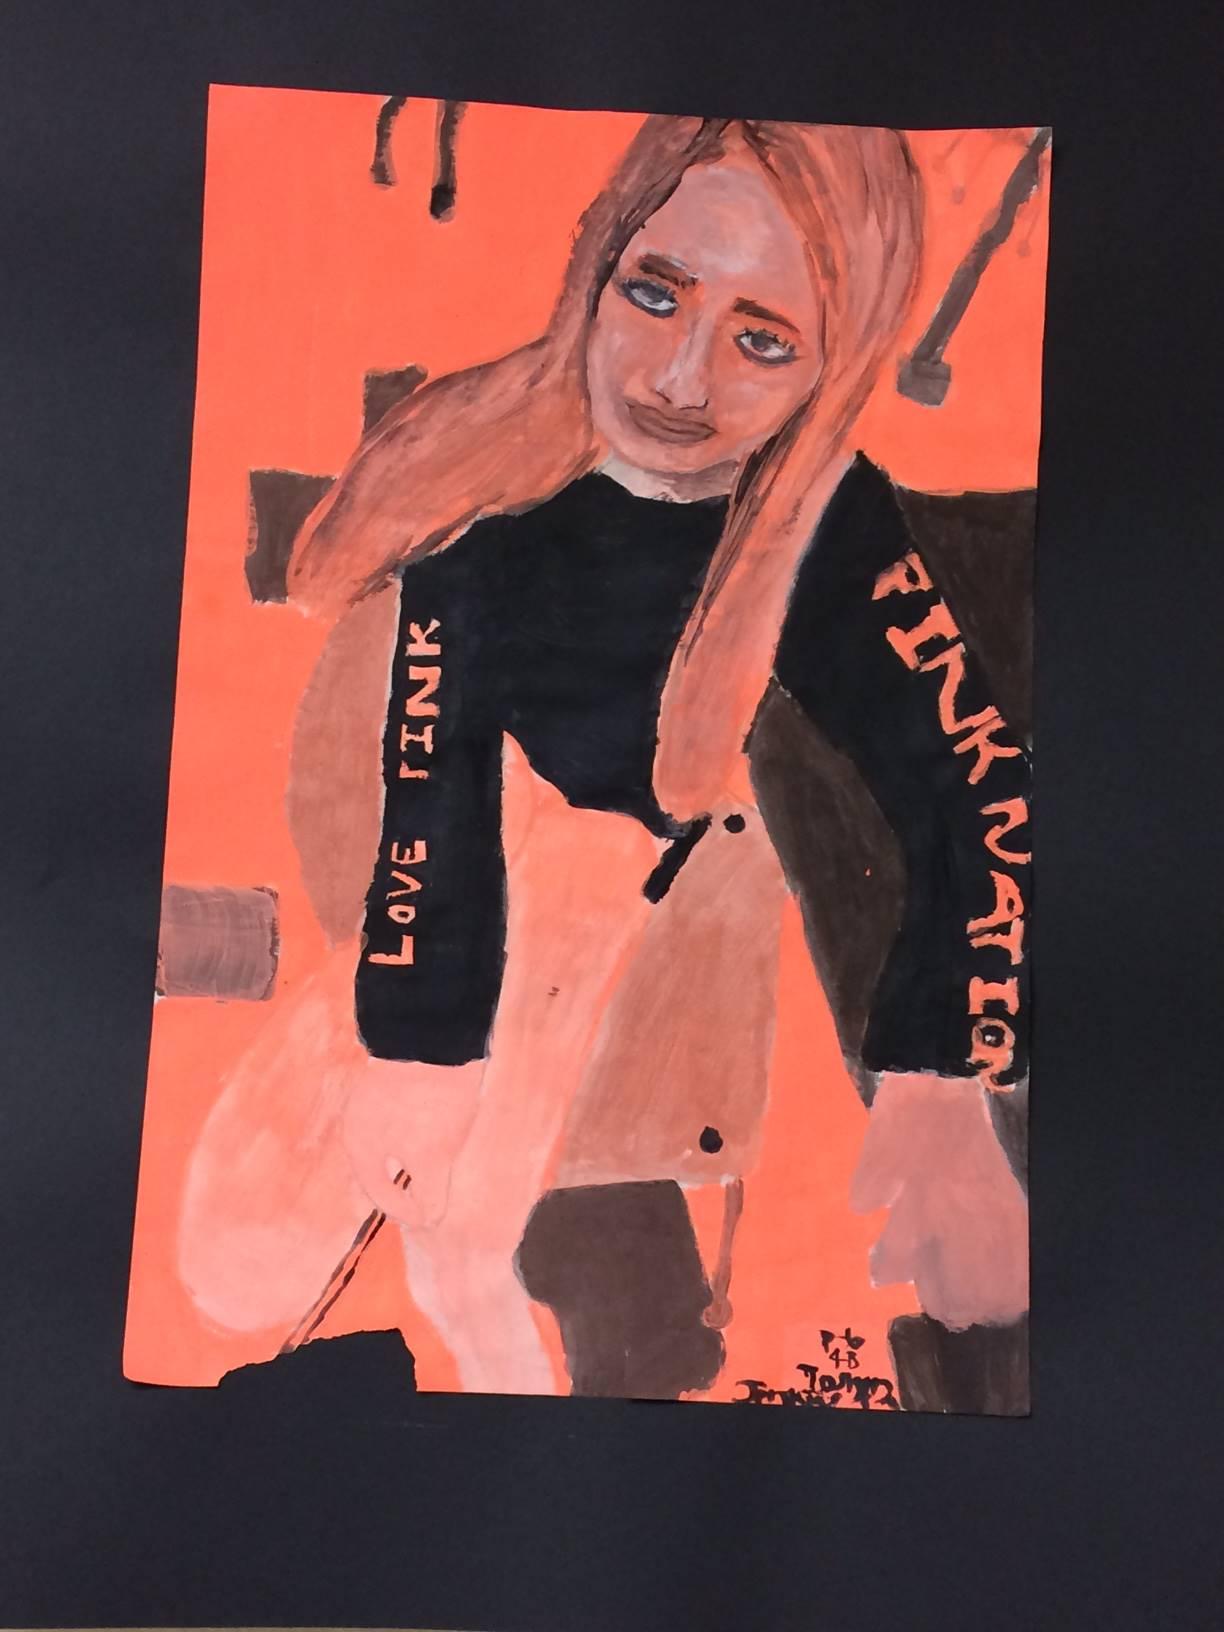 NMS Art